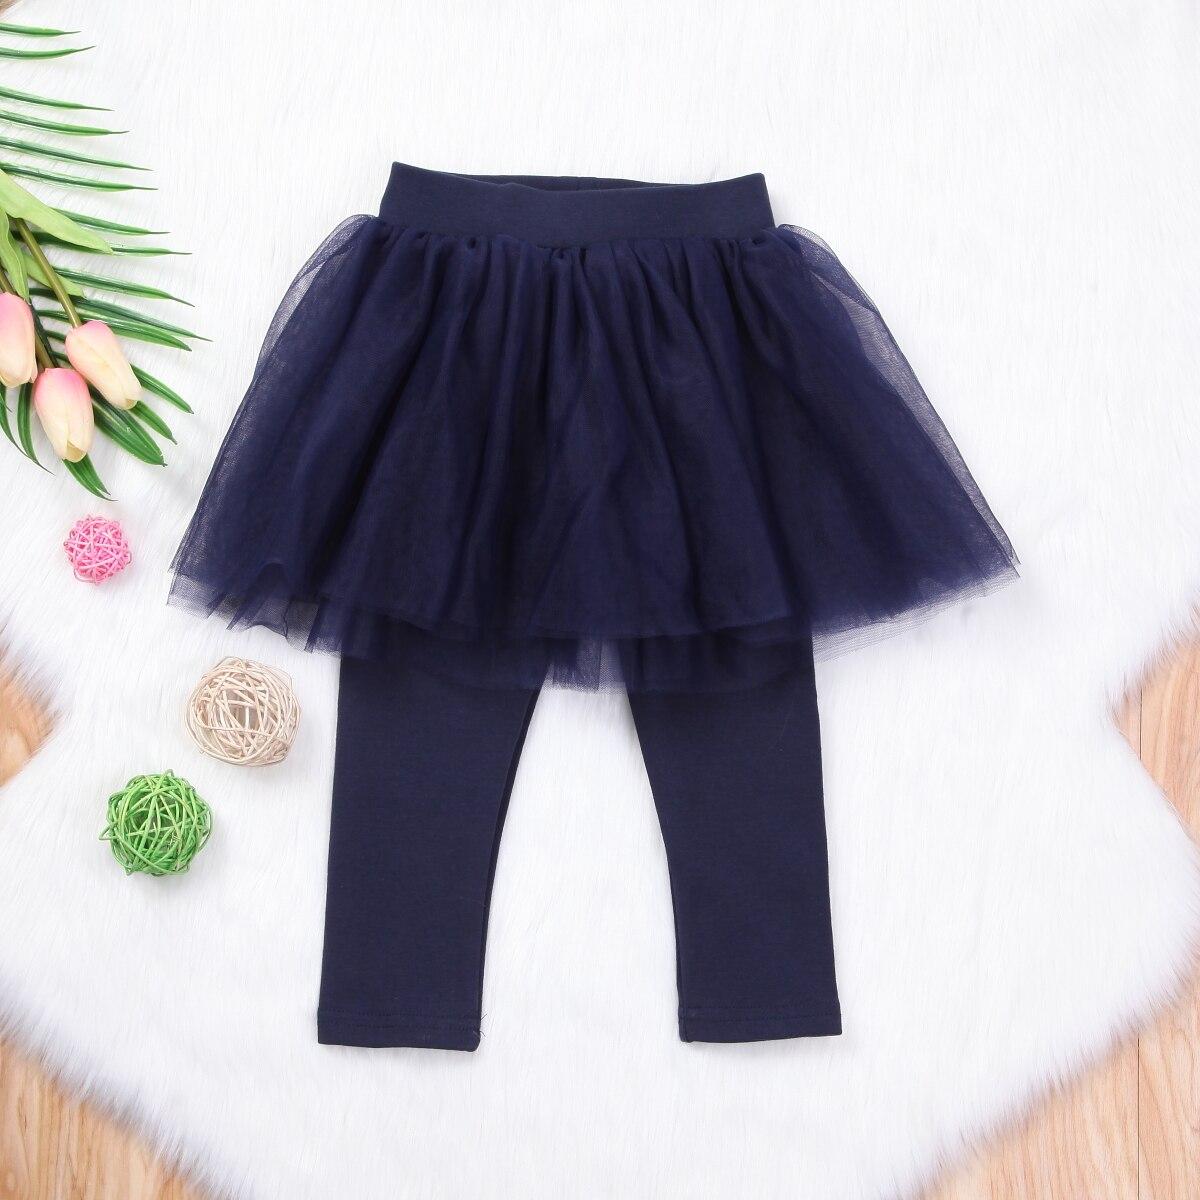 4colors Baby Kids Girls Lace Tutu Skirt Princess Leggings Pants Culotte Pantskirt Clothes 1-6T